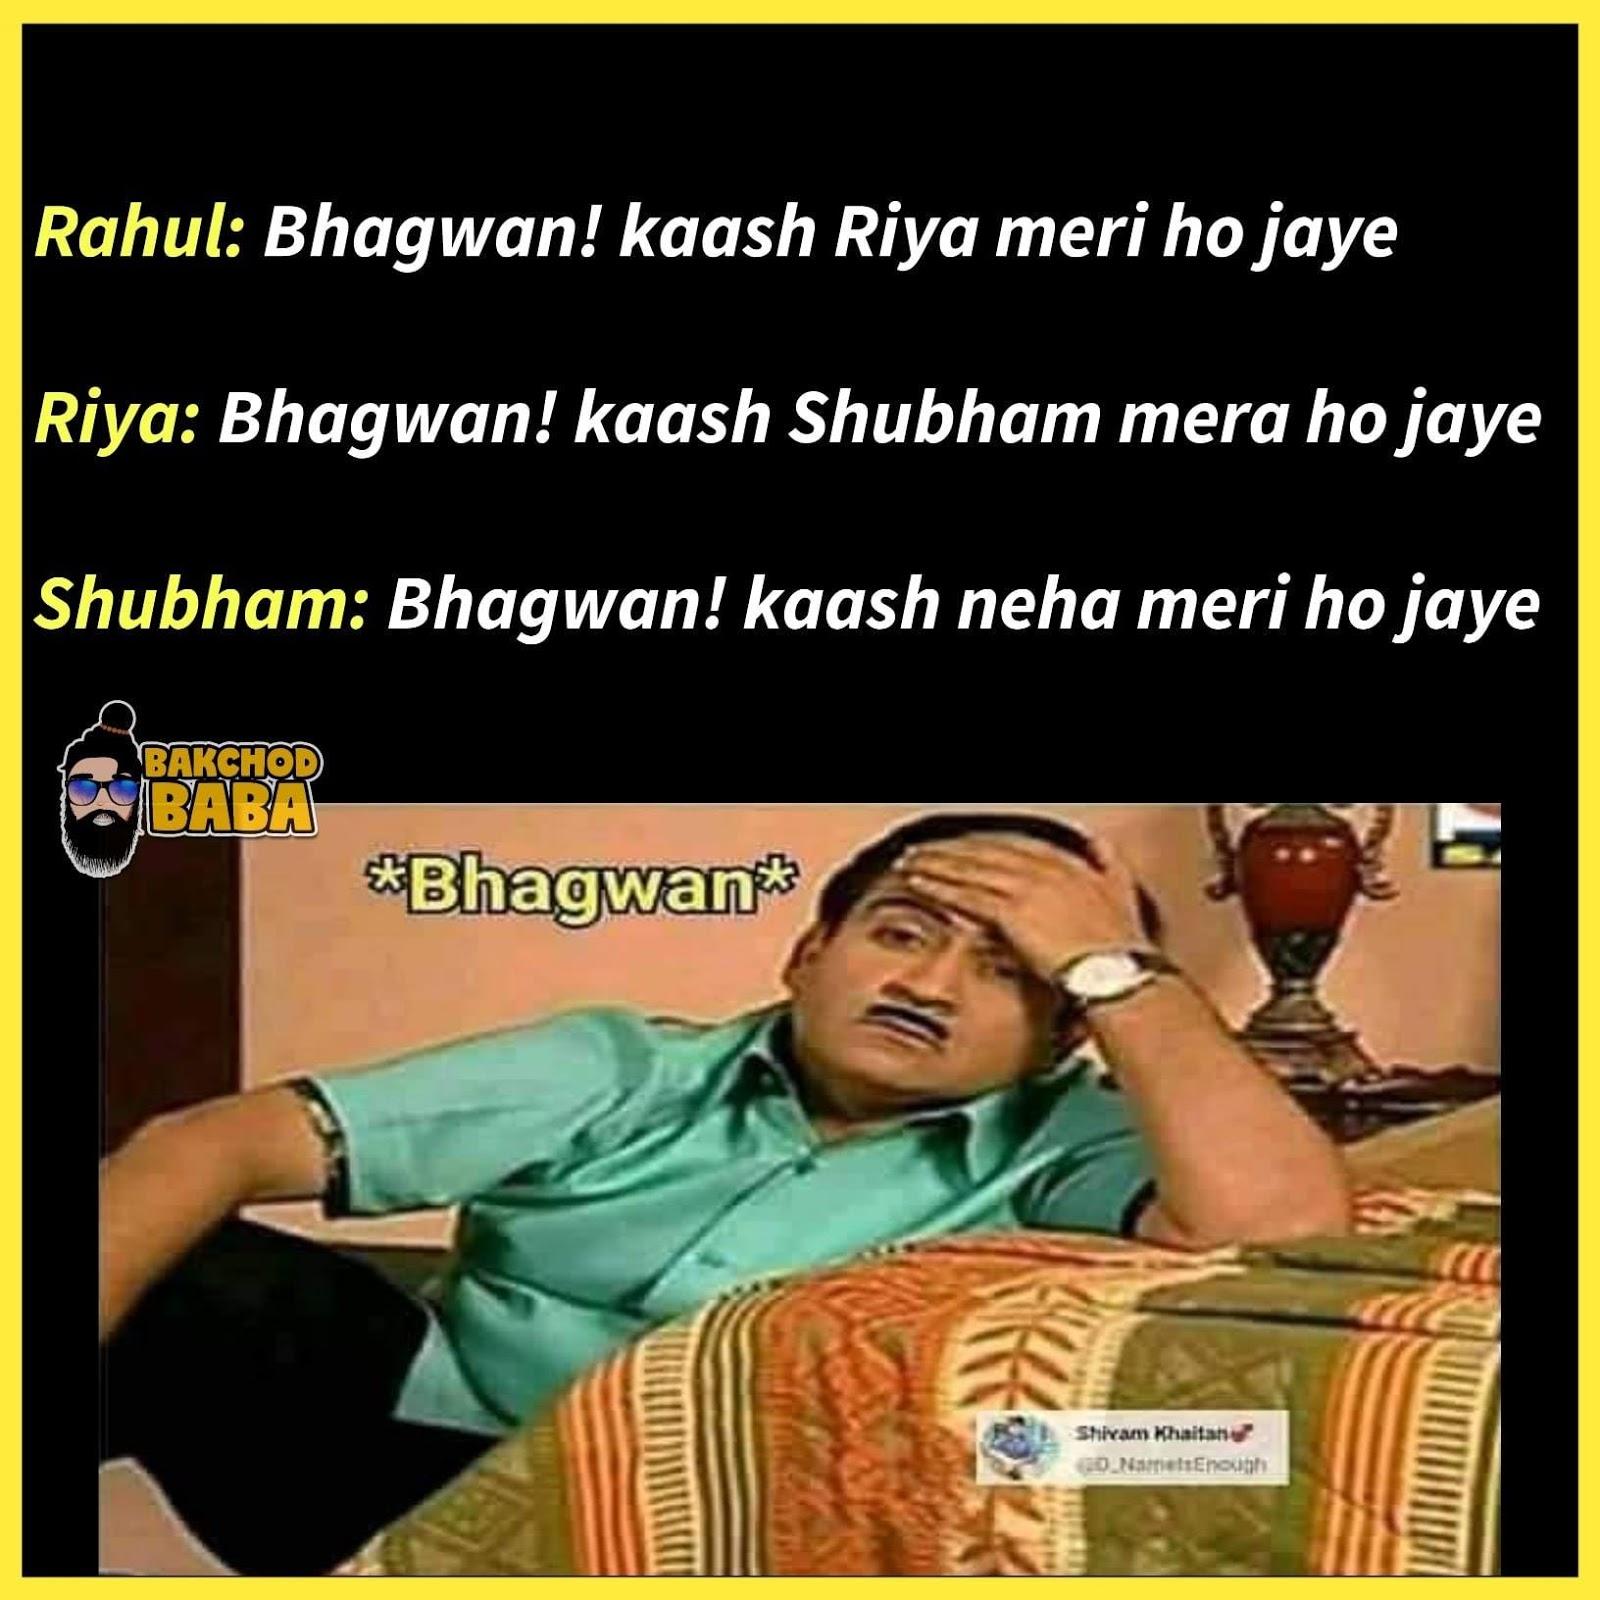 Bakchod Baba : Jethalal Champaklal Funny Meme